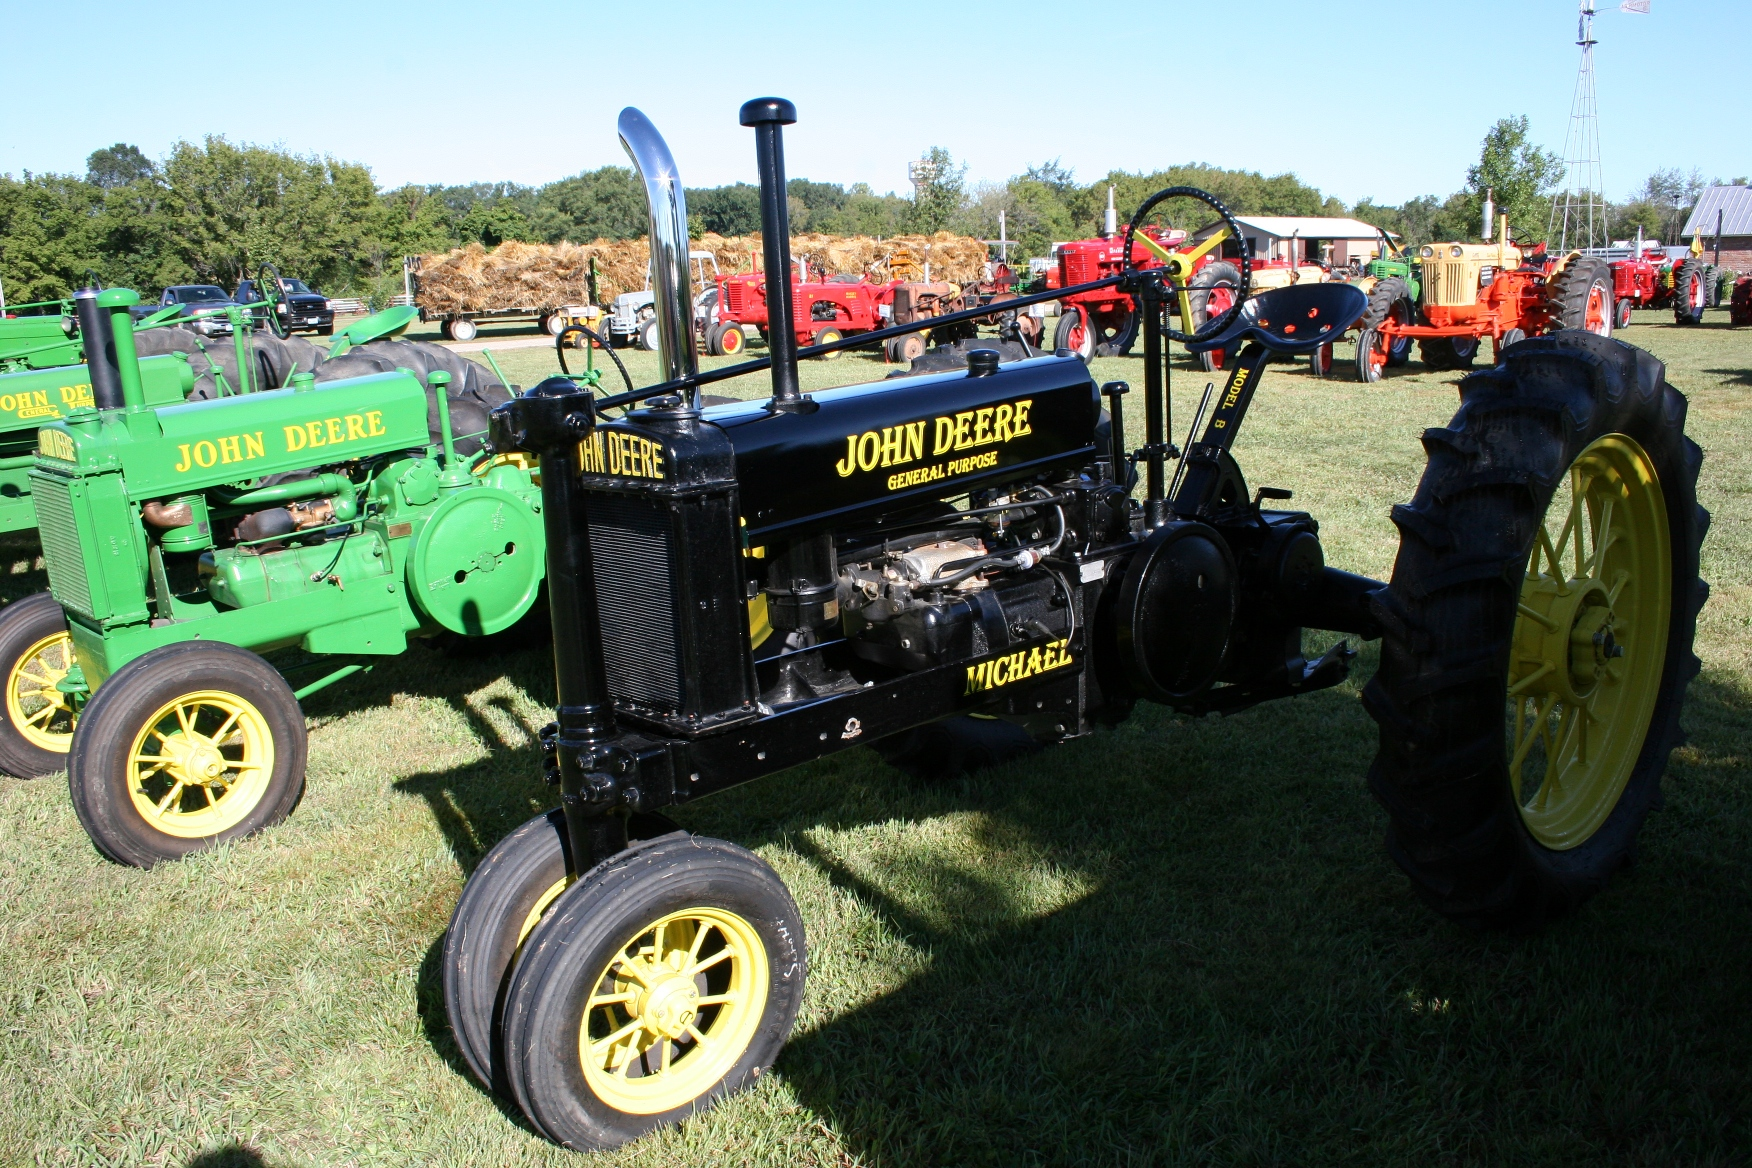 John Deere Tractor Shows : Proud to show john deere colors when is it too much